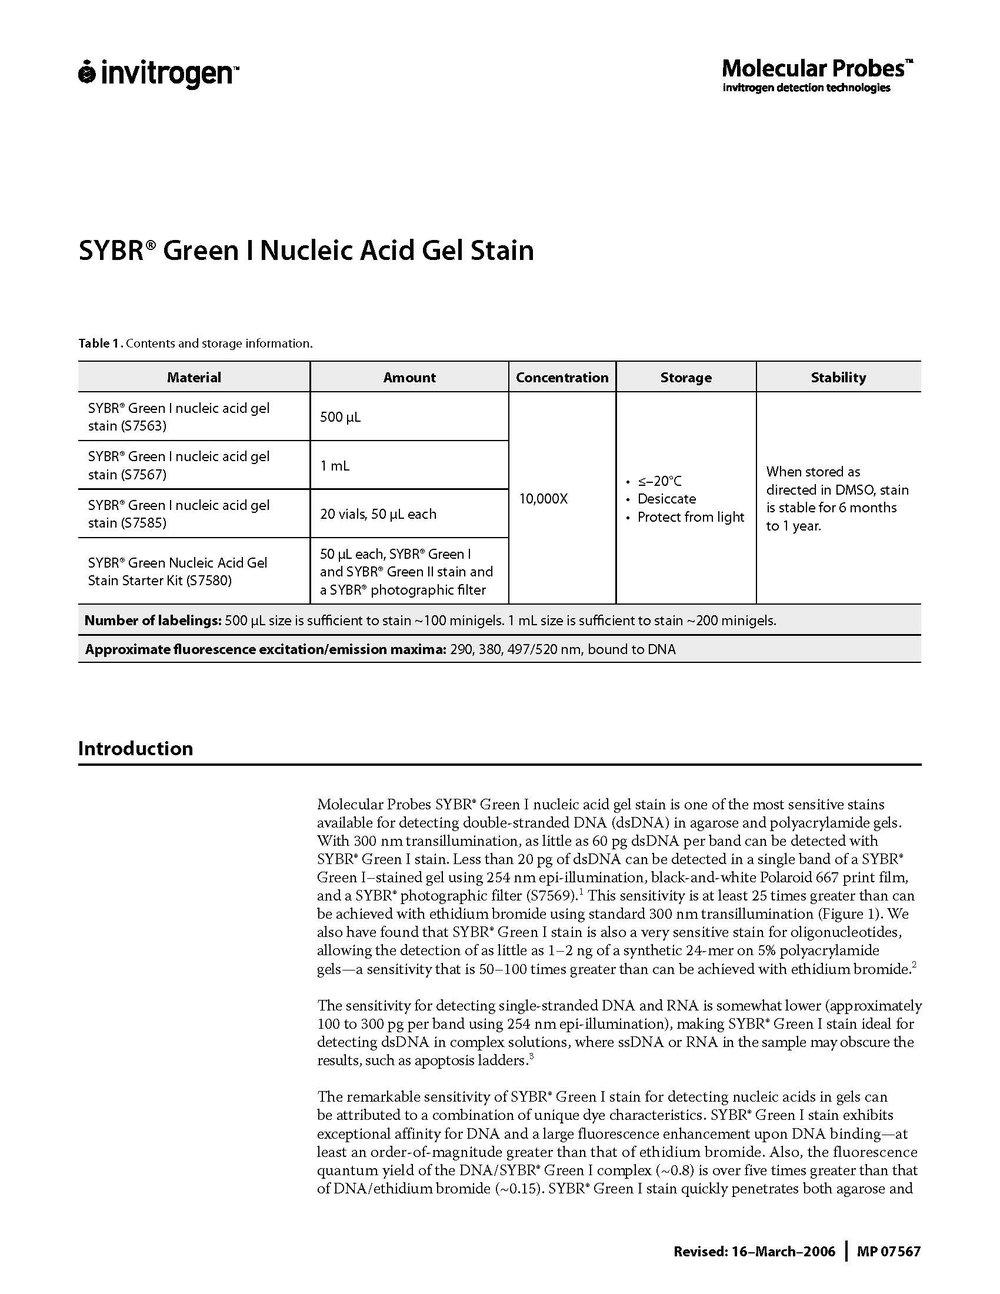 SYBR data sheet